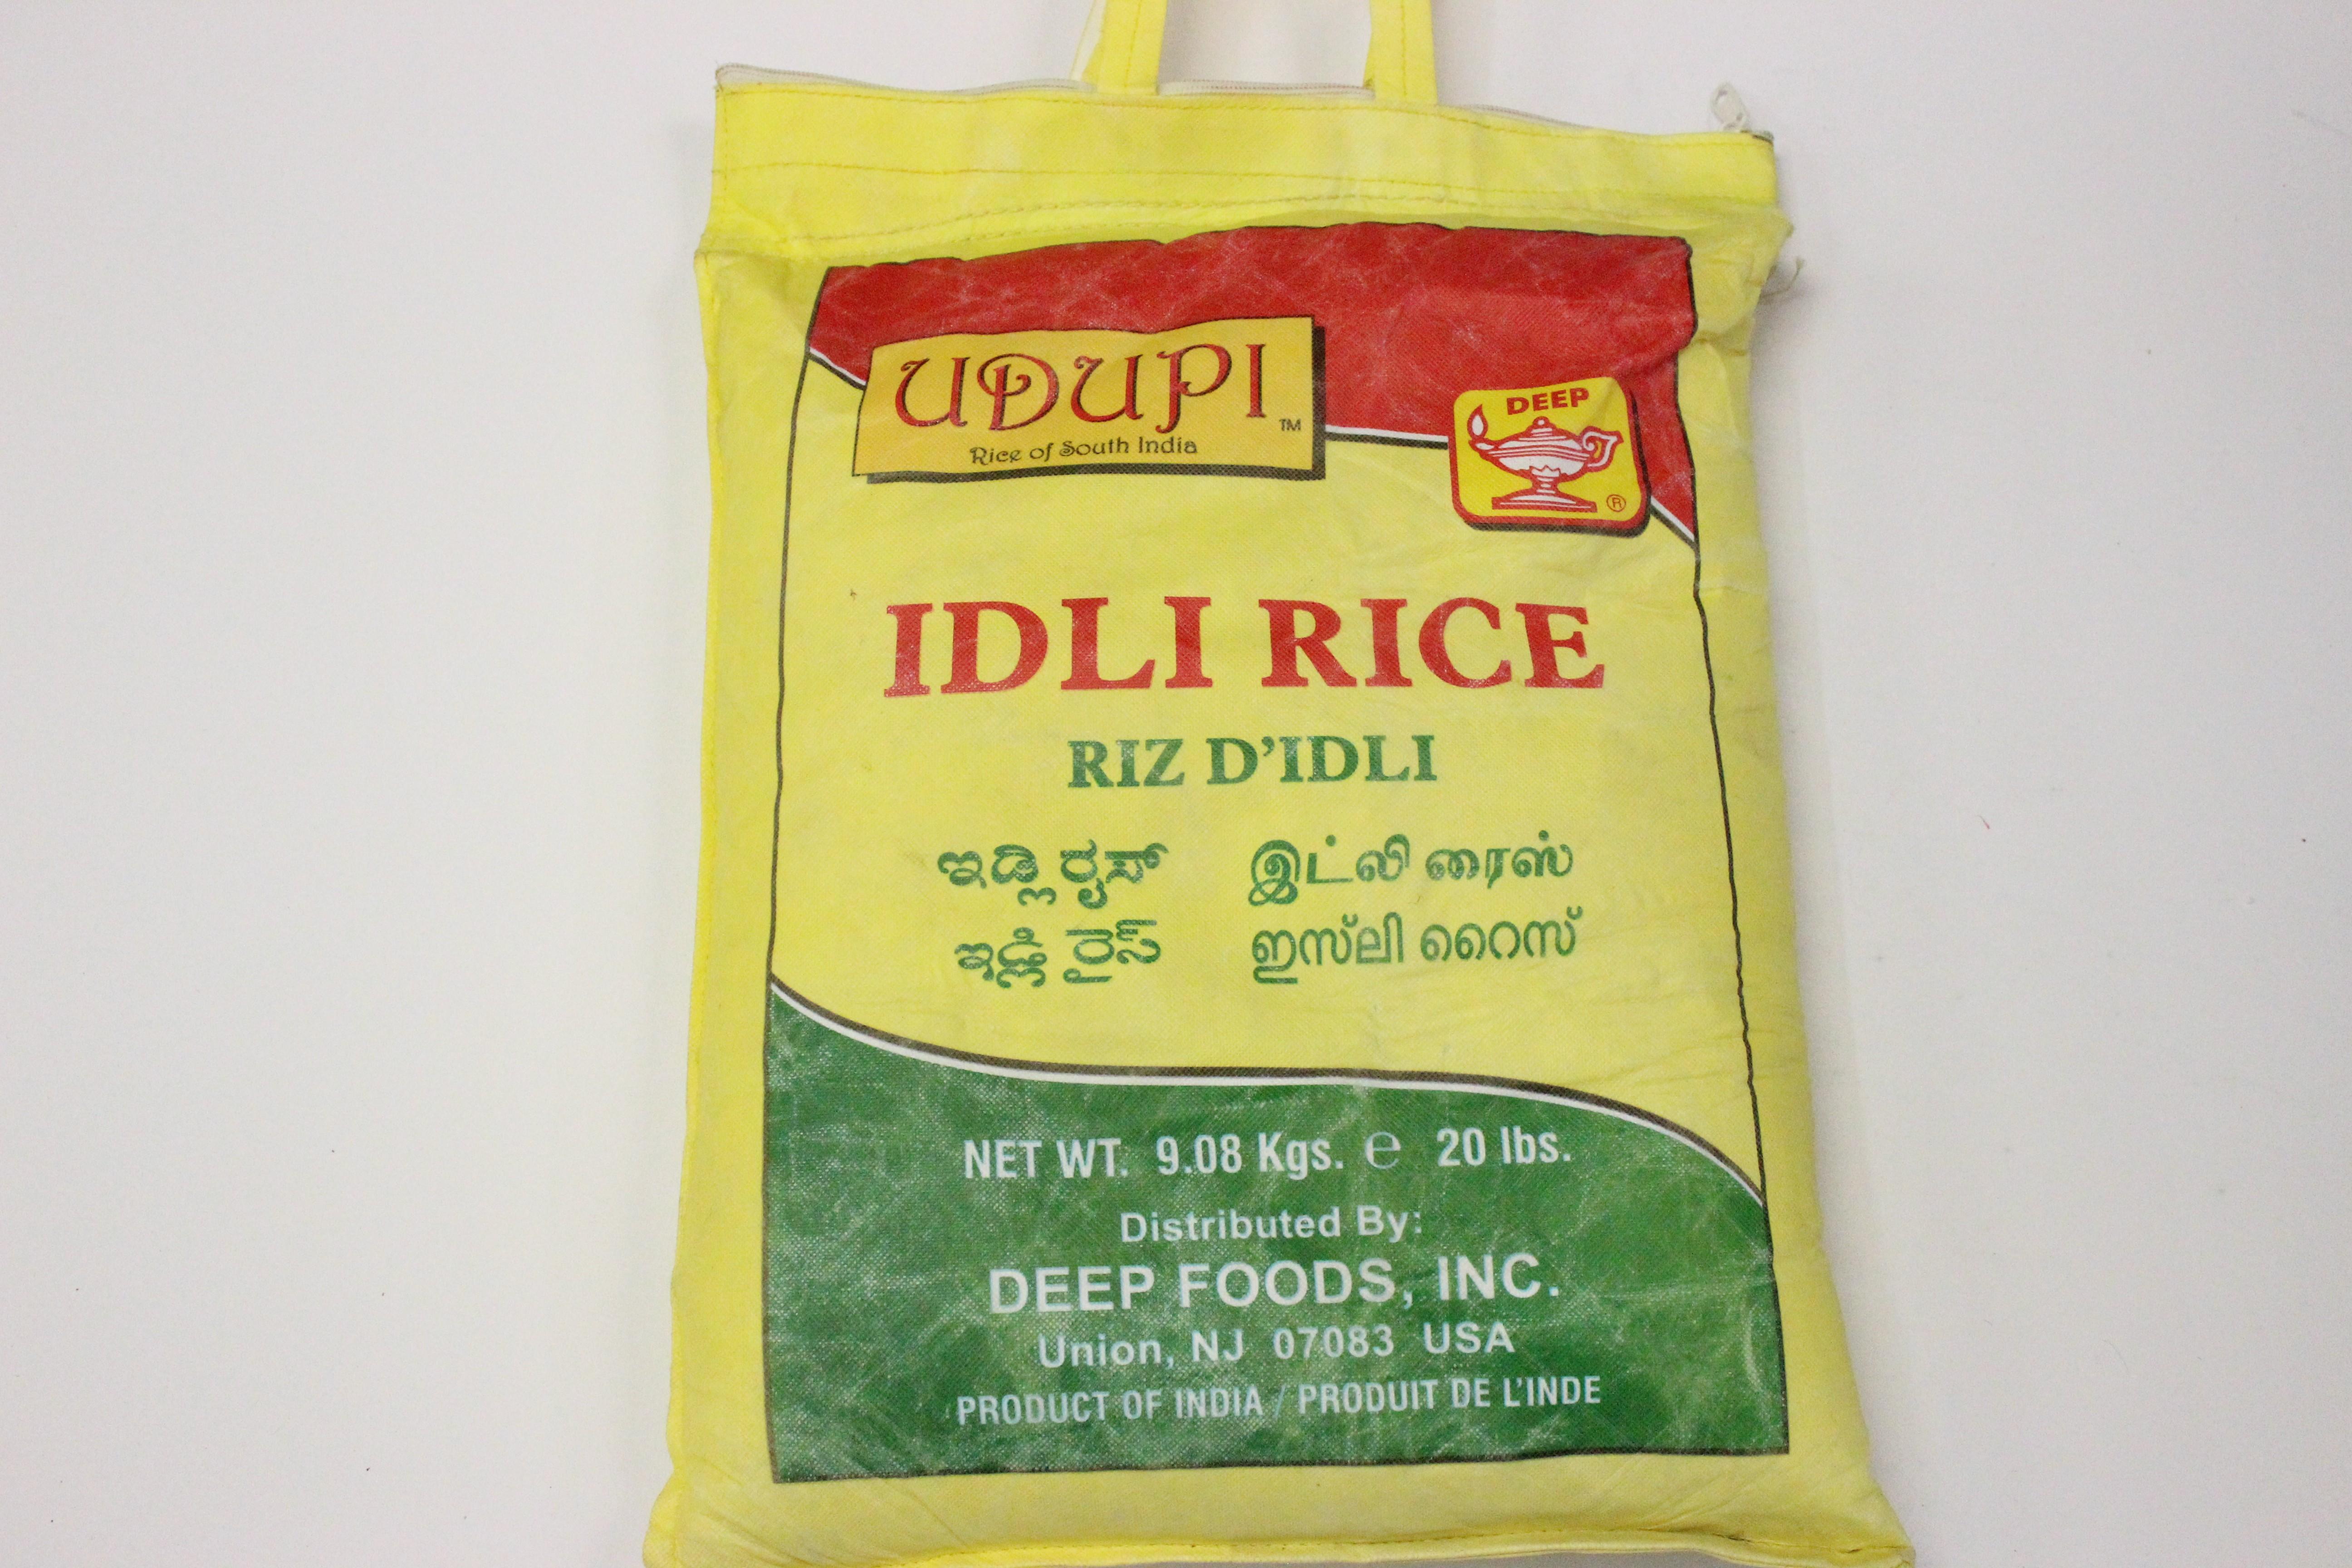 Udupi Idli Rice 20lb